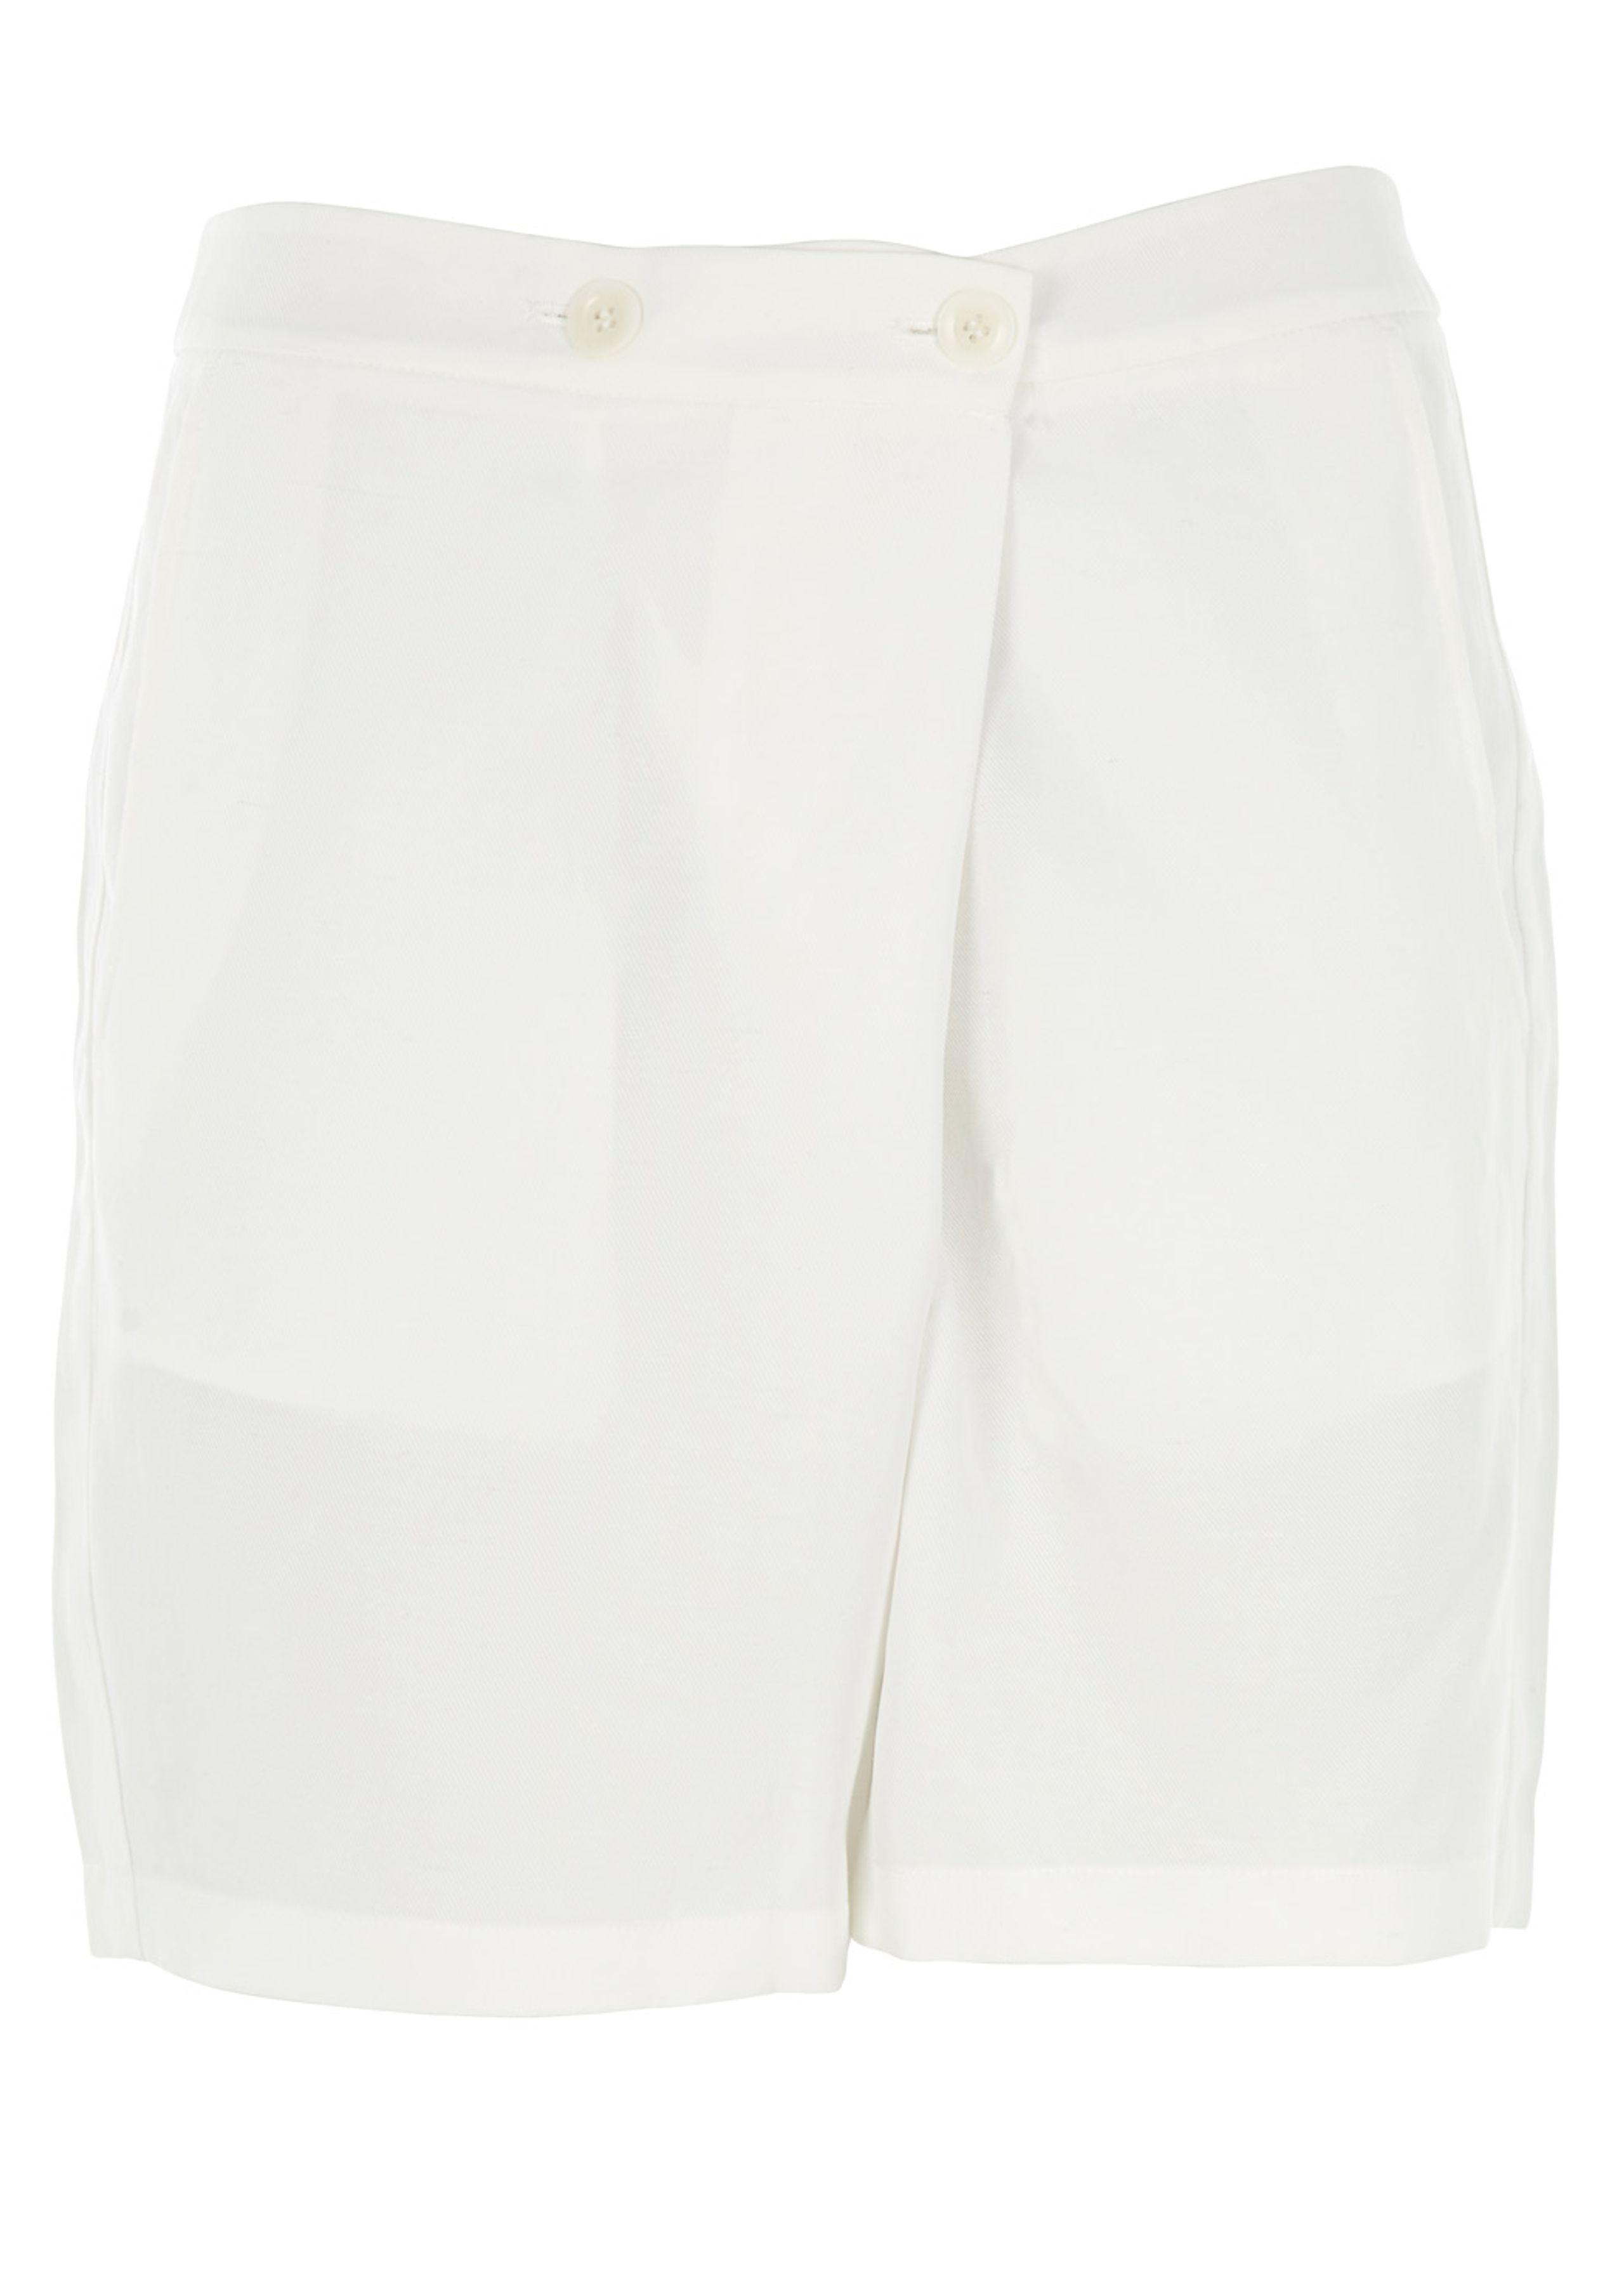 Wrap summer shorts